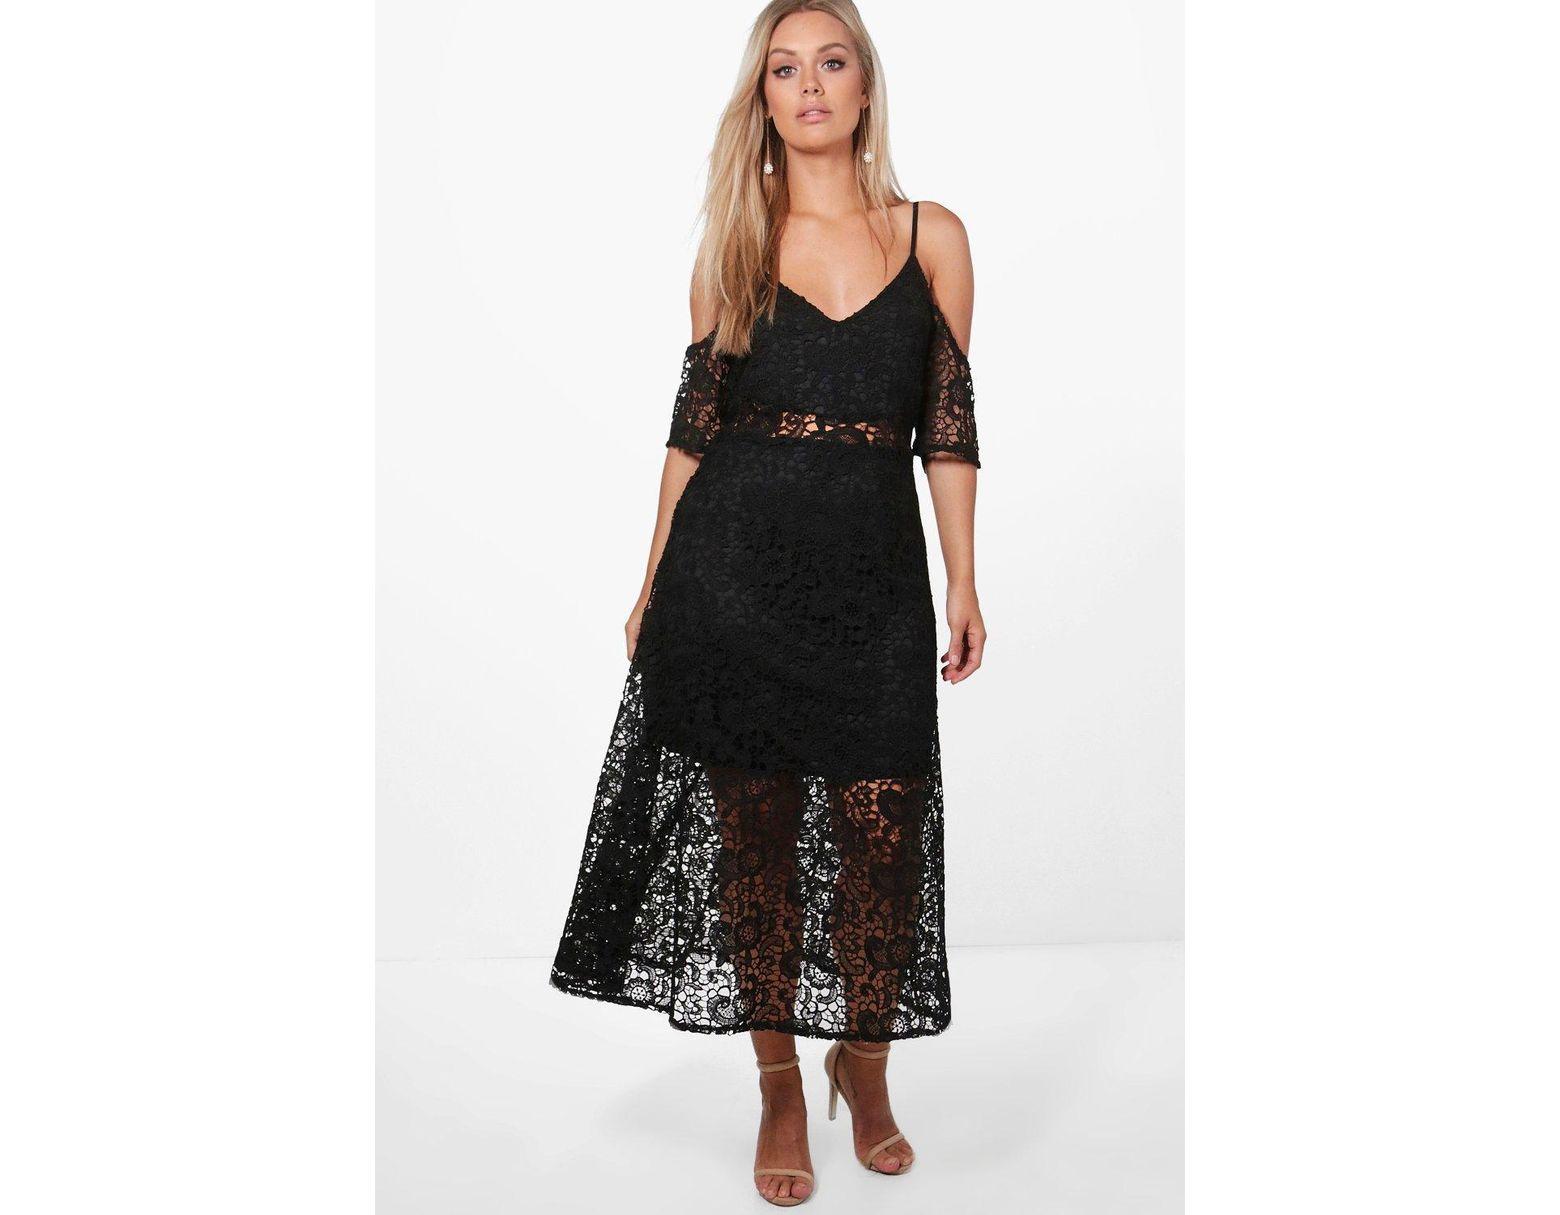 58da90e5d3c7 Boohoo Plus Crochet Lace Premium Skater Dress in Black - Lyst